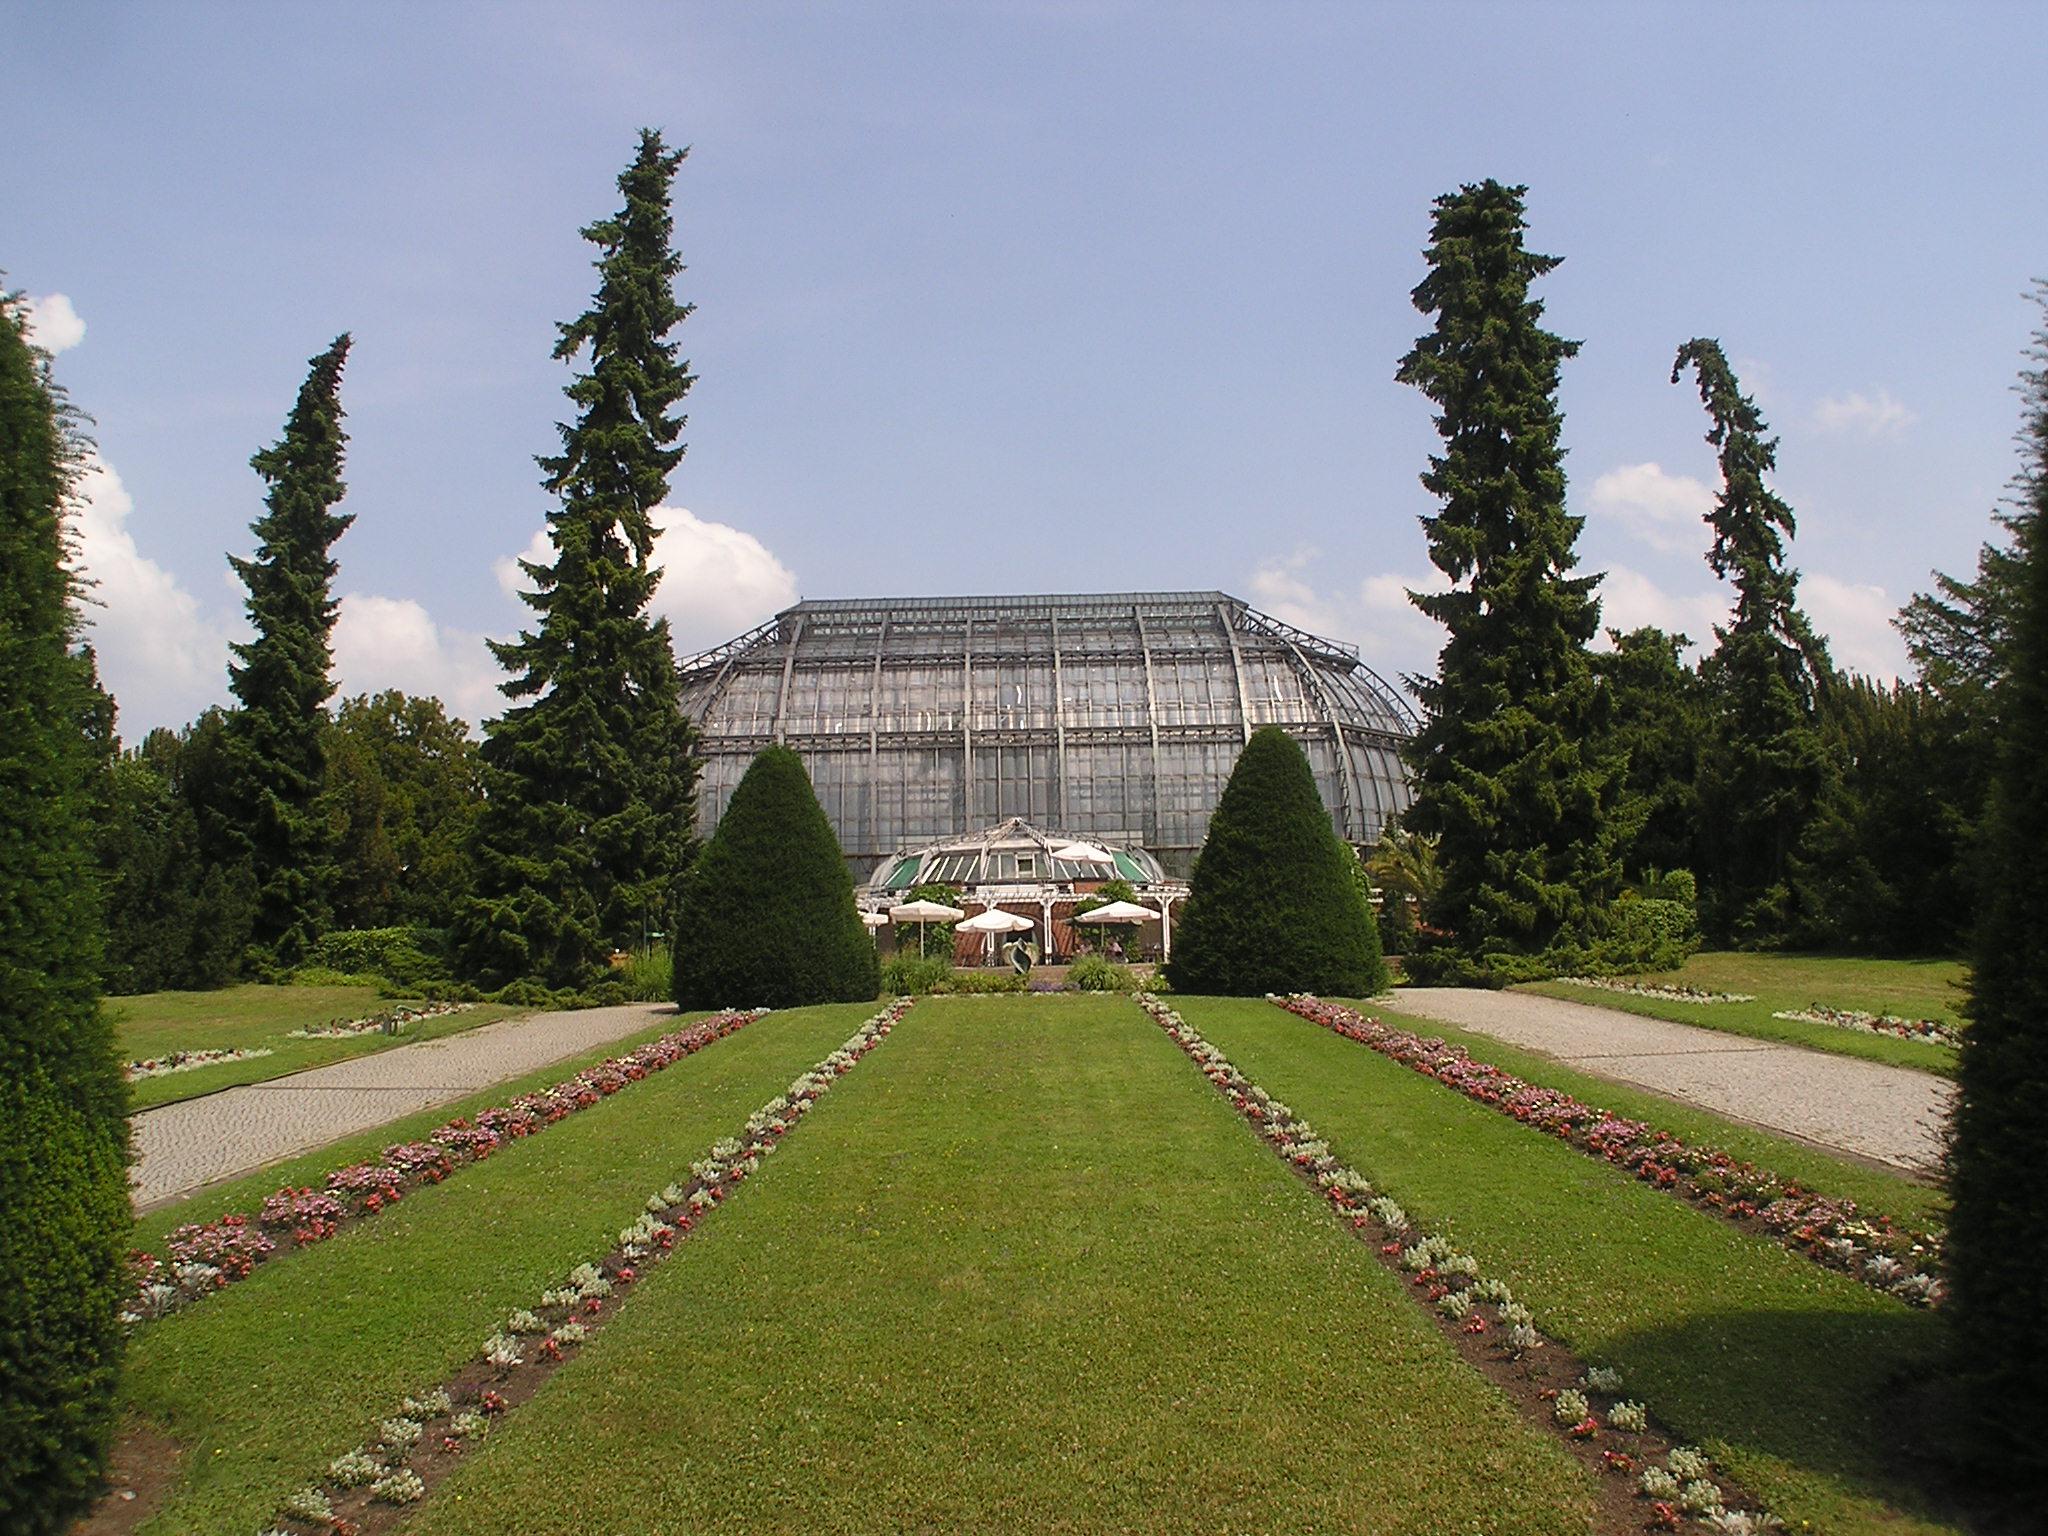 2006 07 07 Botanischer Garten Italienischer Garten